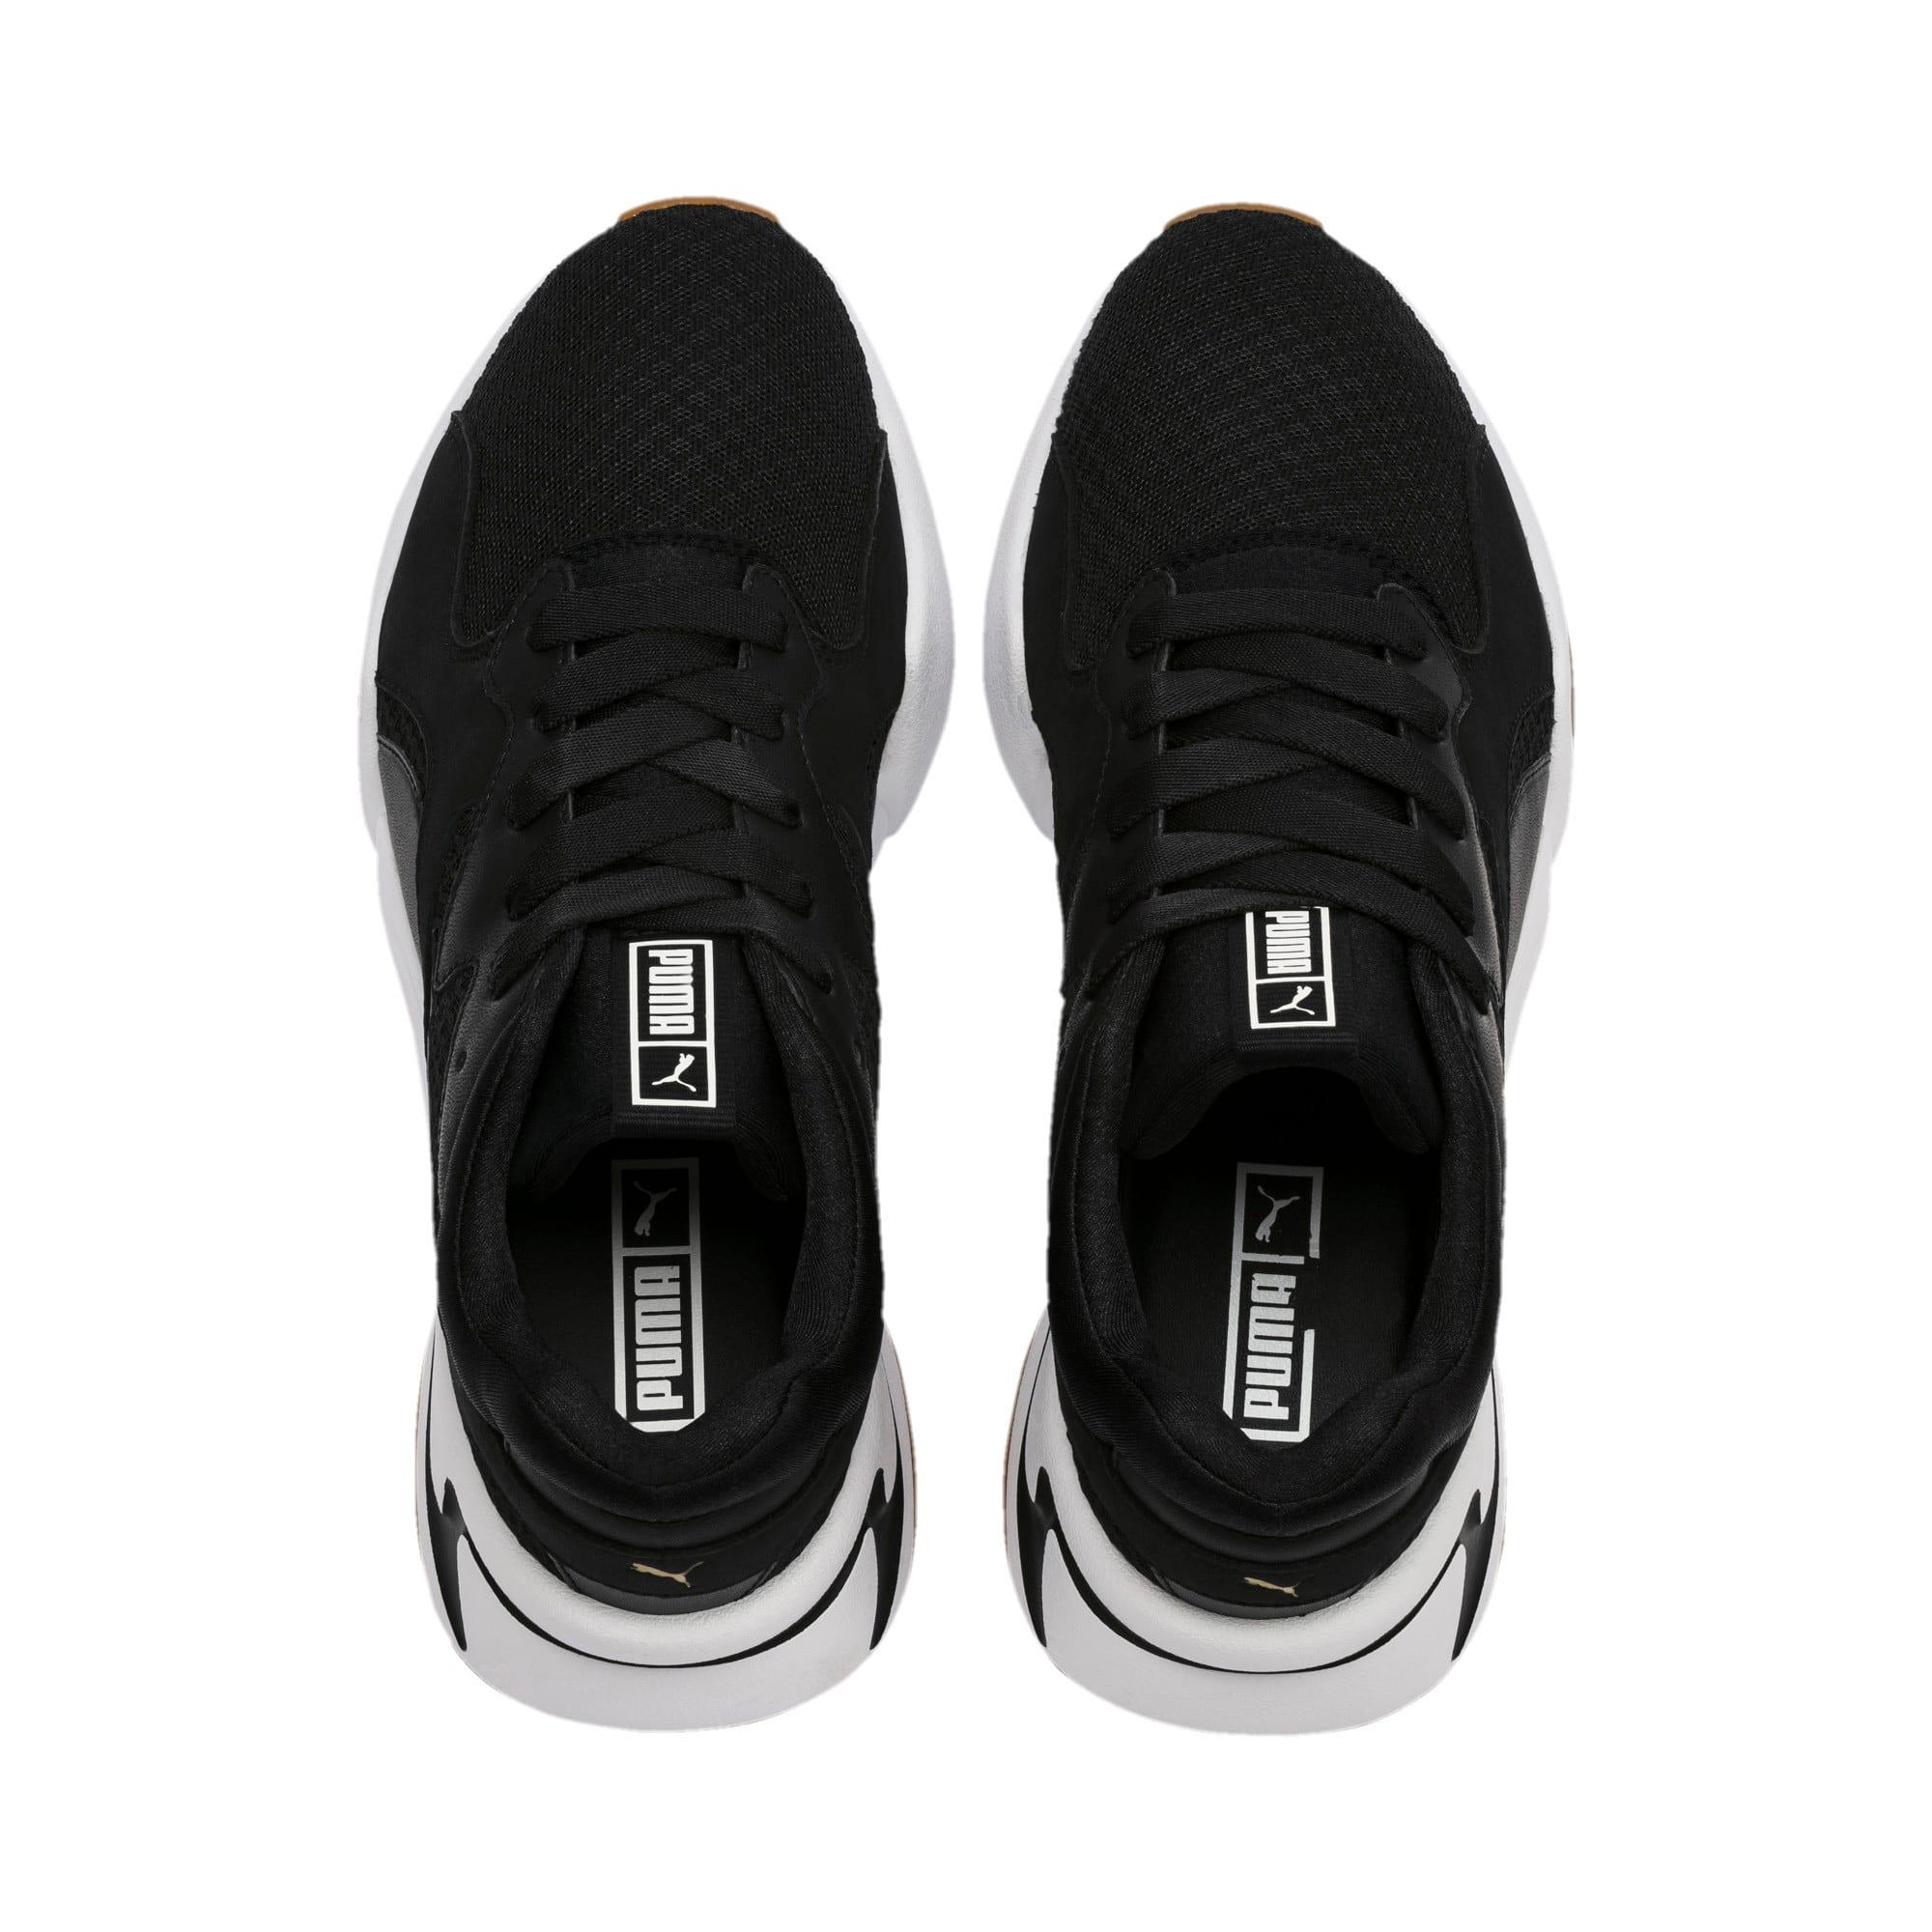 Thumbnail 7 of Nova '90s Bloc Women's Sneakers, Puma Black-Puma Black, medium